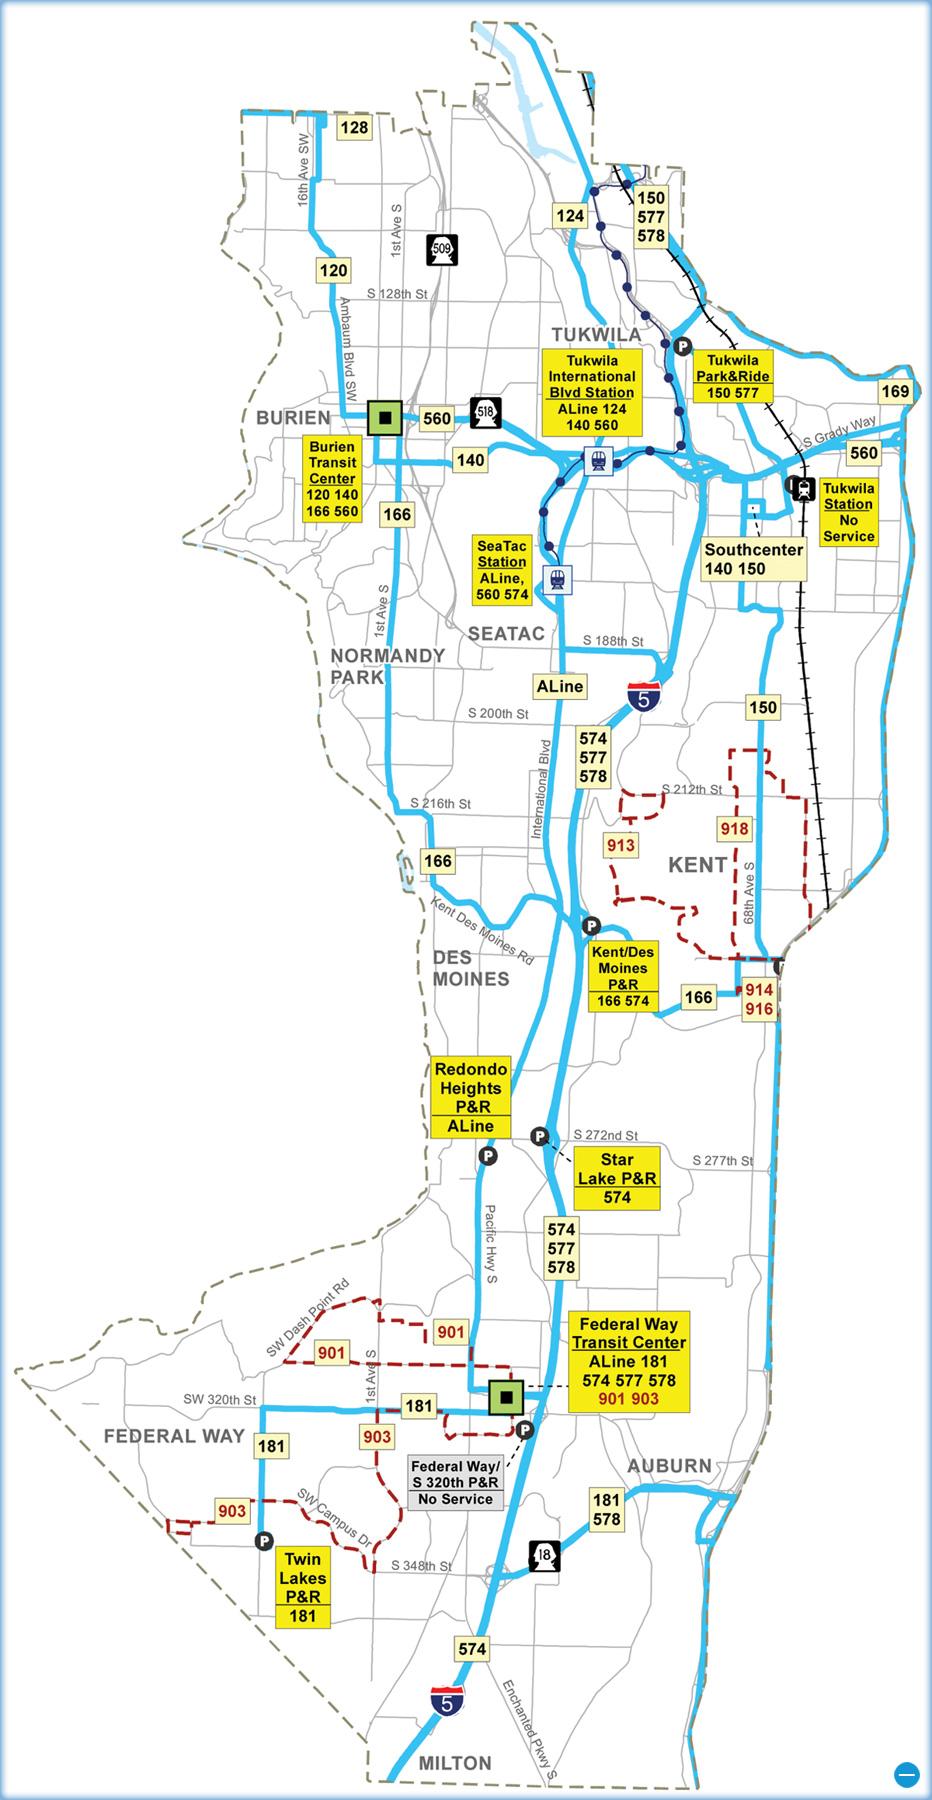 Southwest King County - Emergency Service Network - King